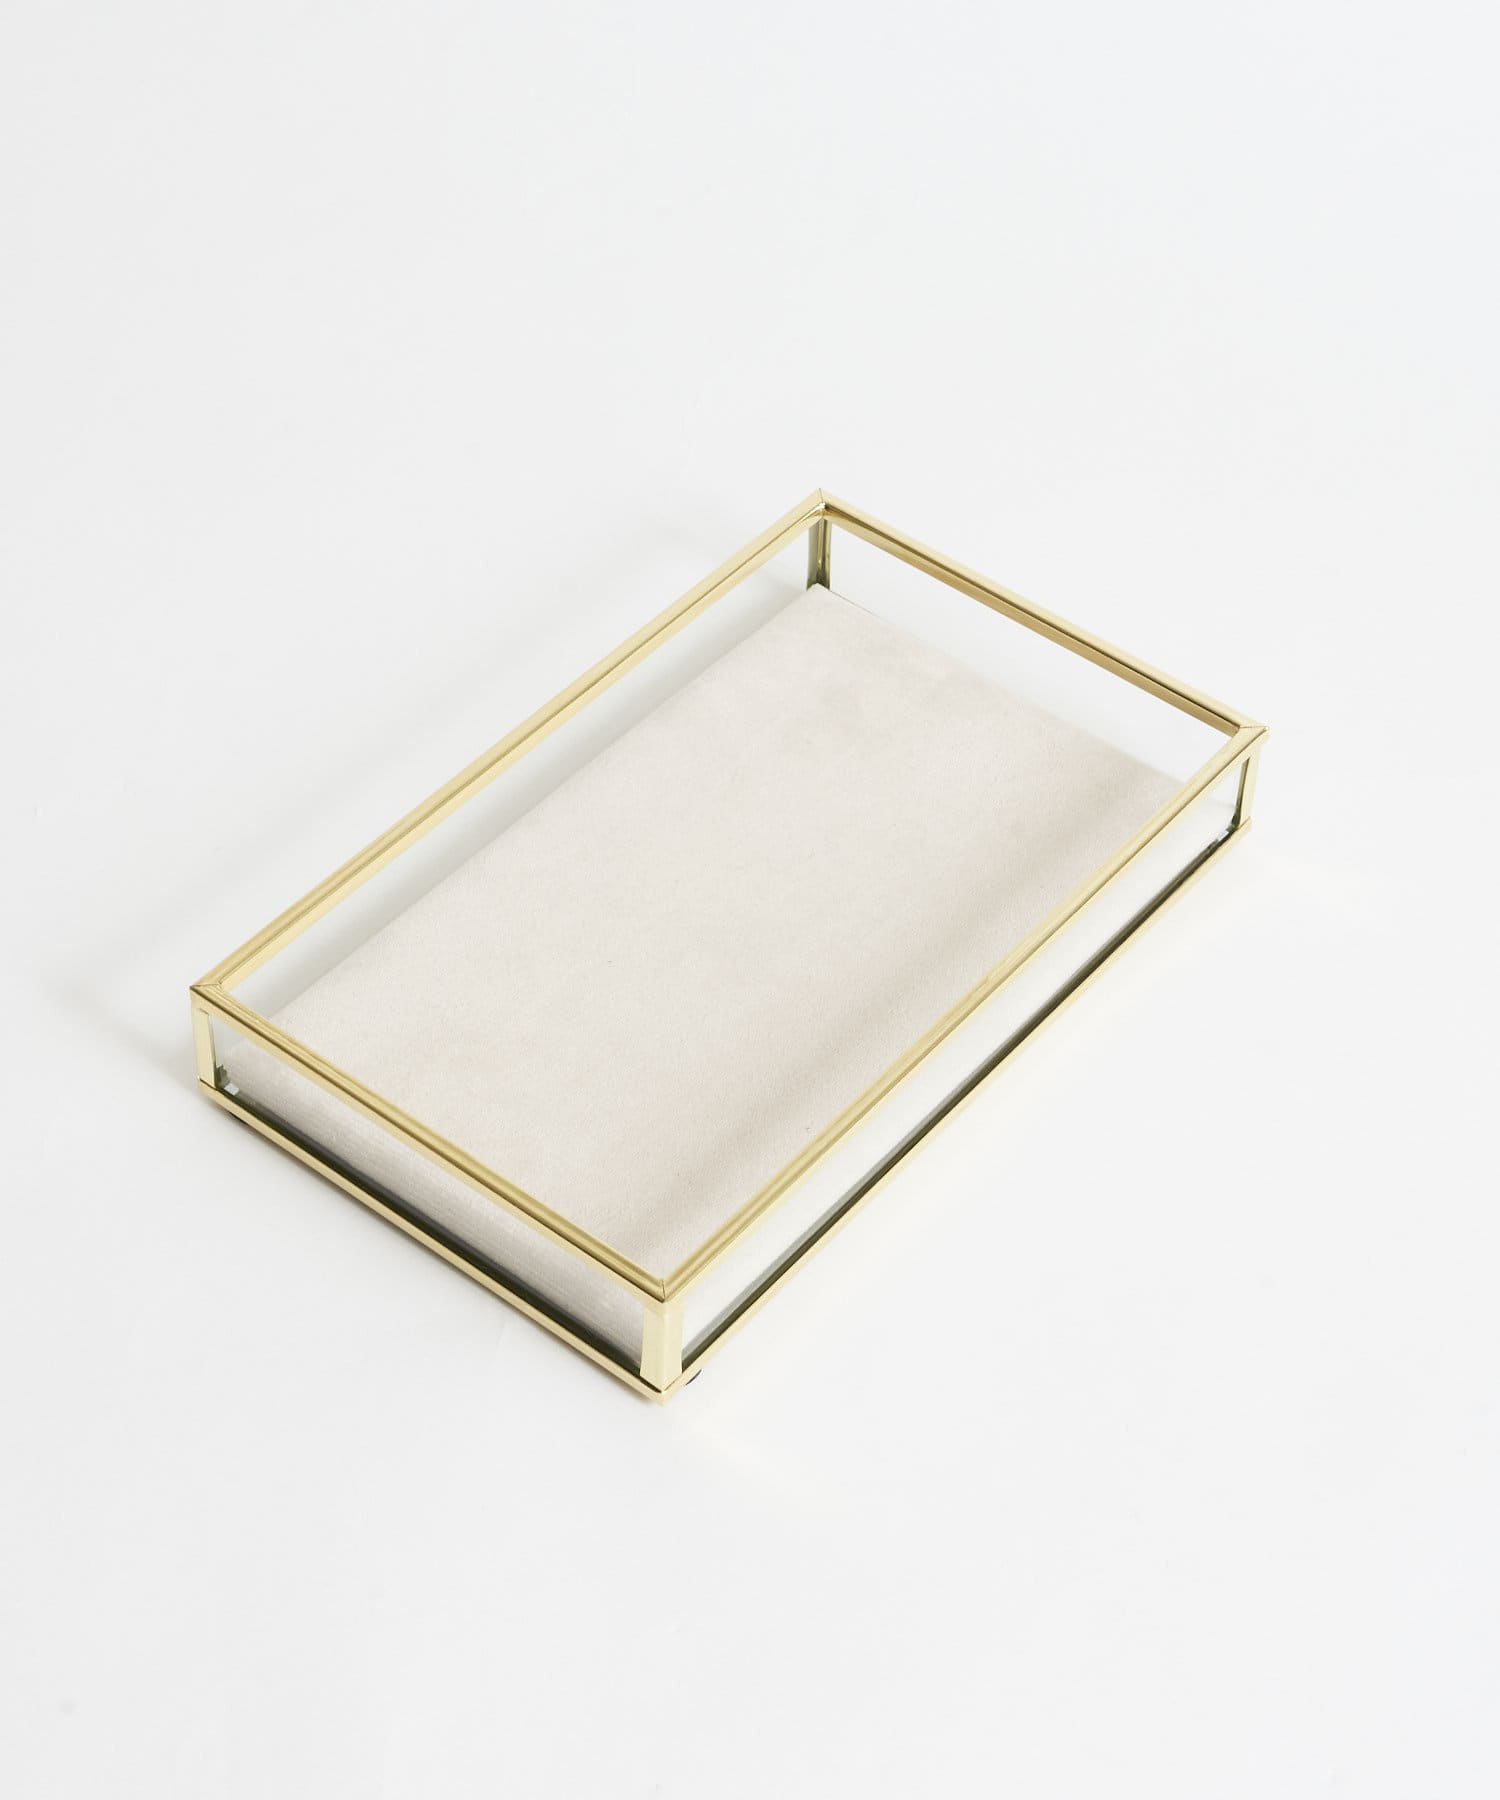 Lattice(ラティス) 【Ray9月号掲載】《オシャレに収納》GOLDFRAME ベロアトレイ(長方形)